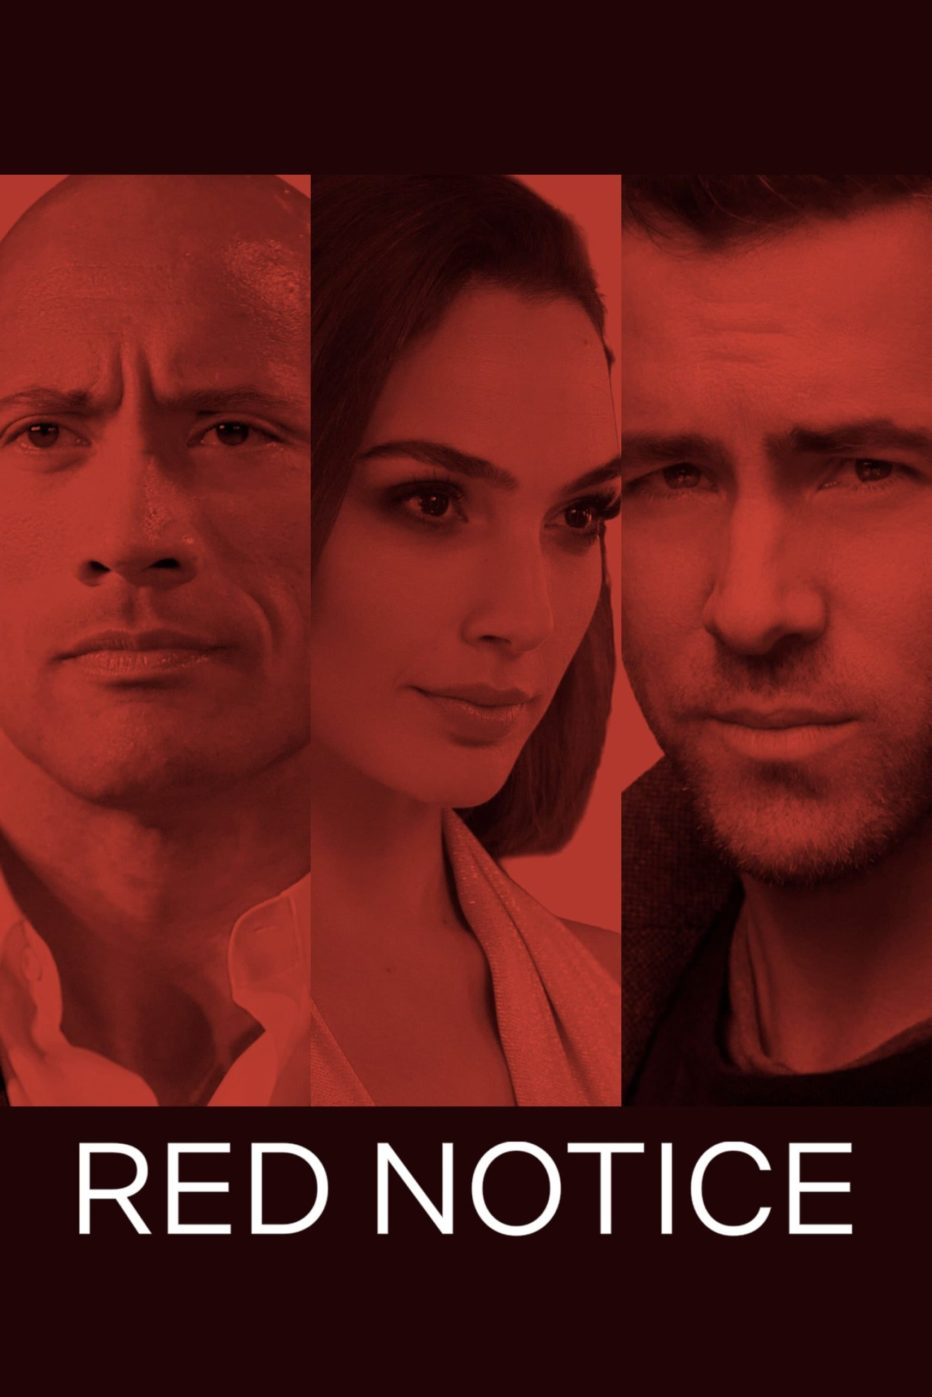 Trailer de Alerta roja: Netflix se gasta la pasta con Ryan Reynolds, Dwayne Johnson y Gal Gadot